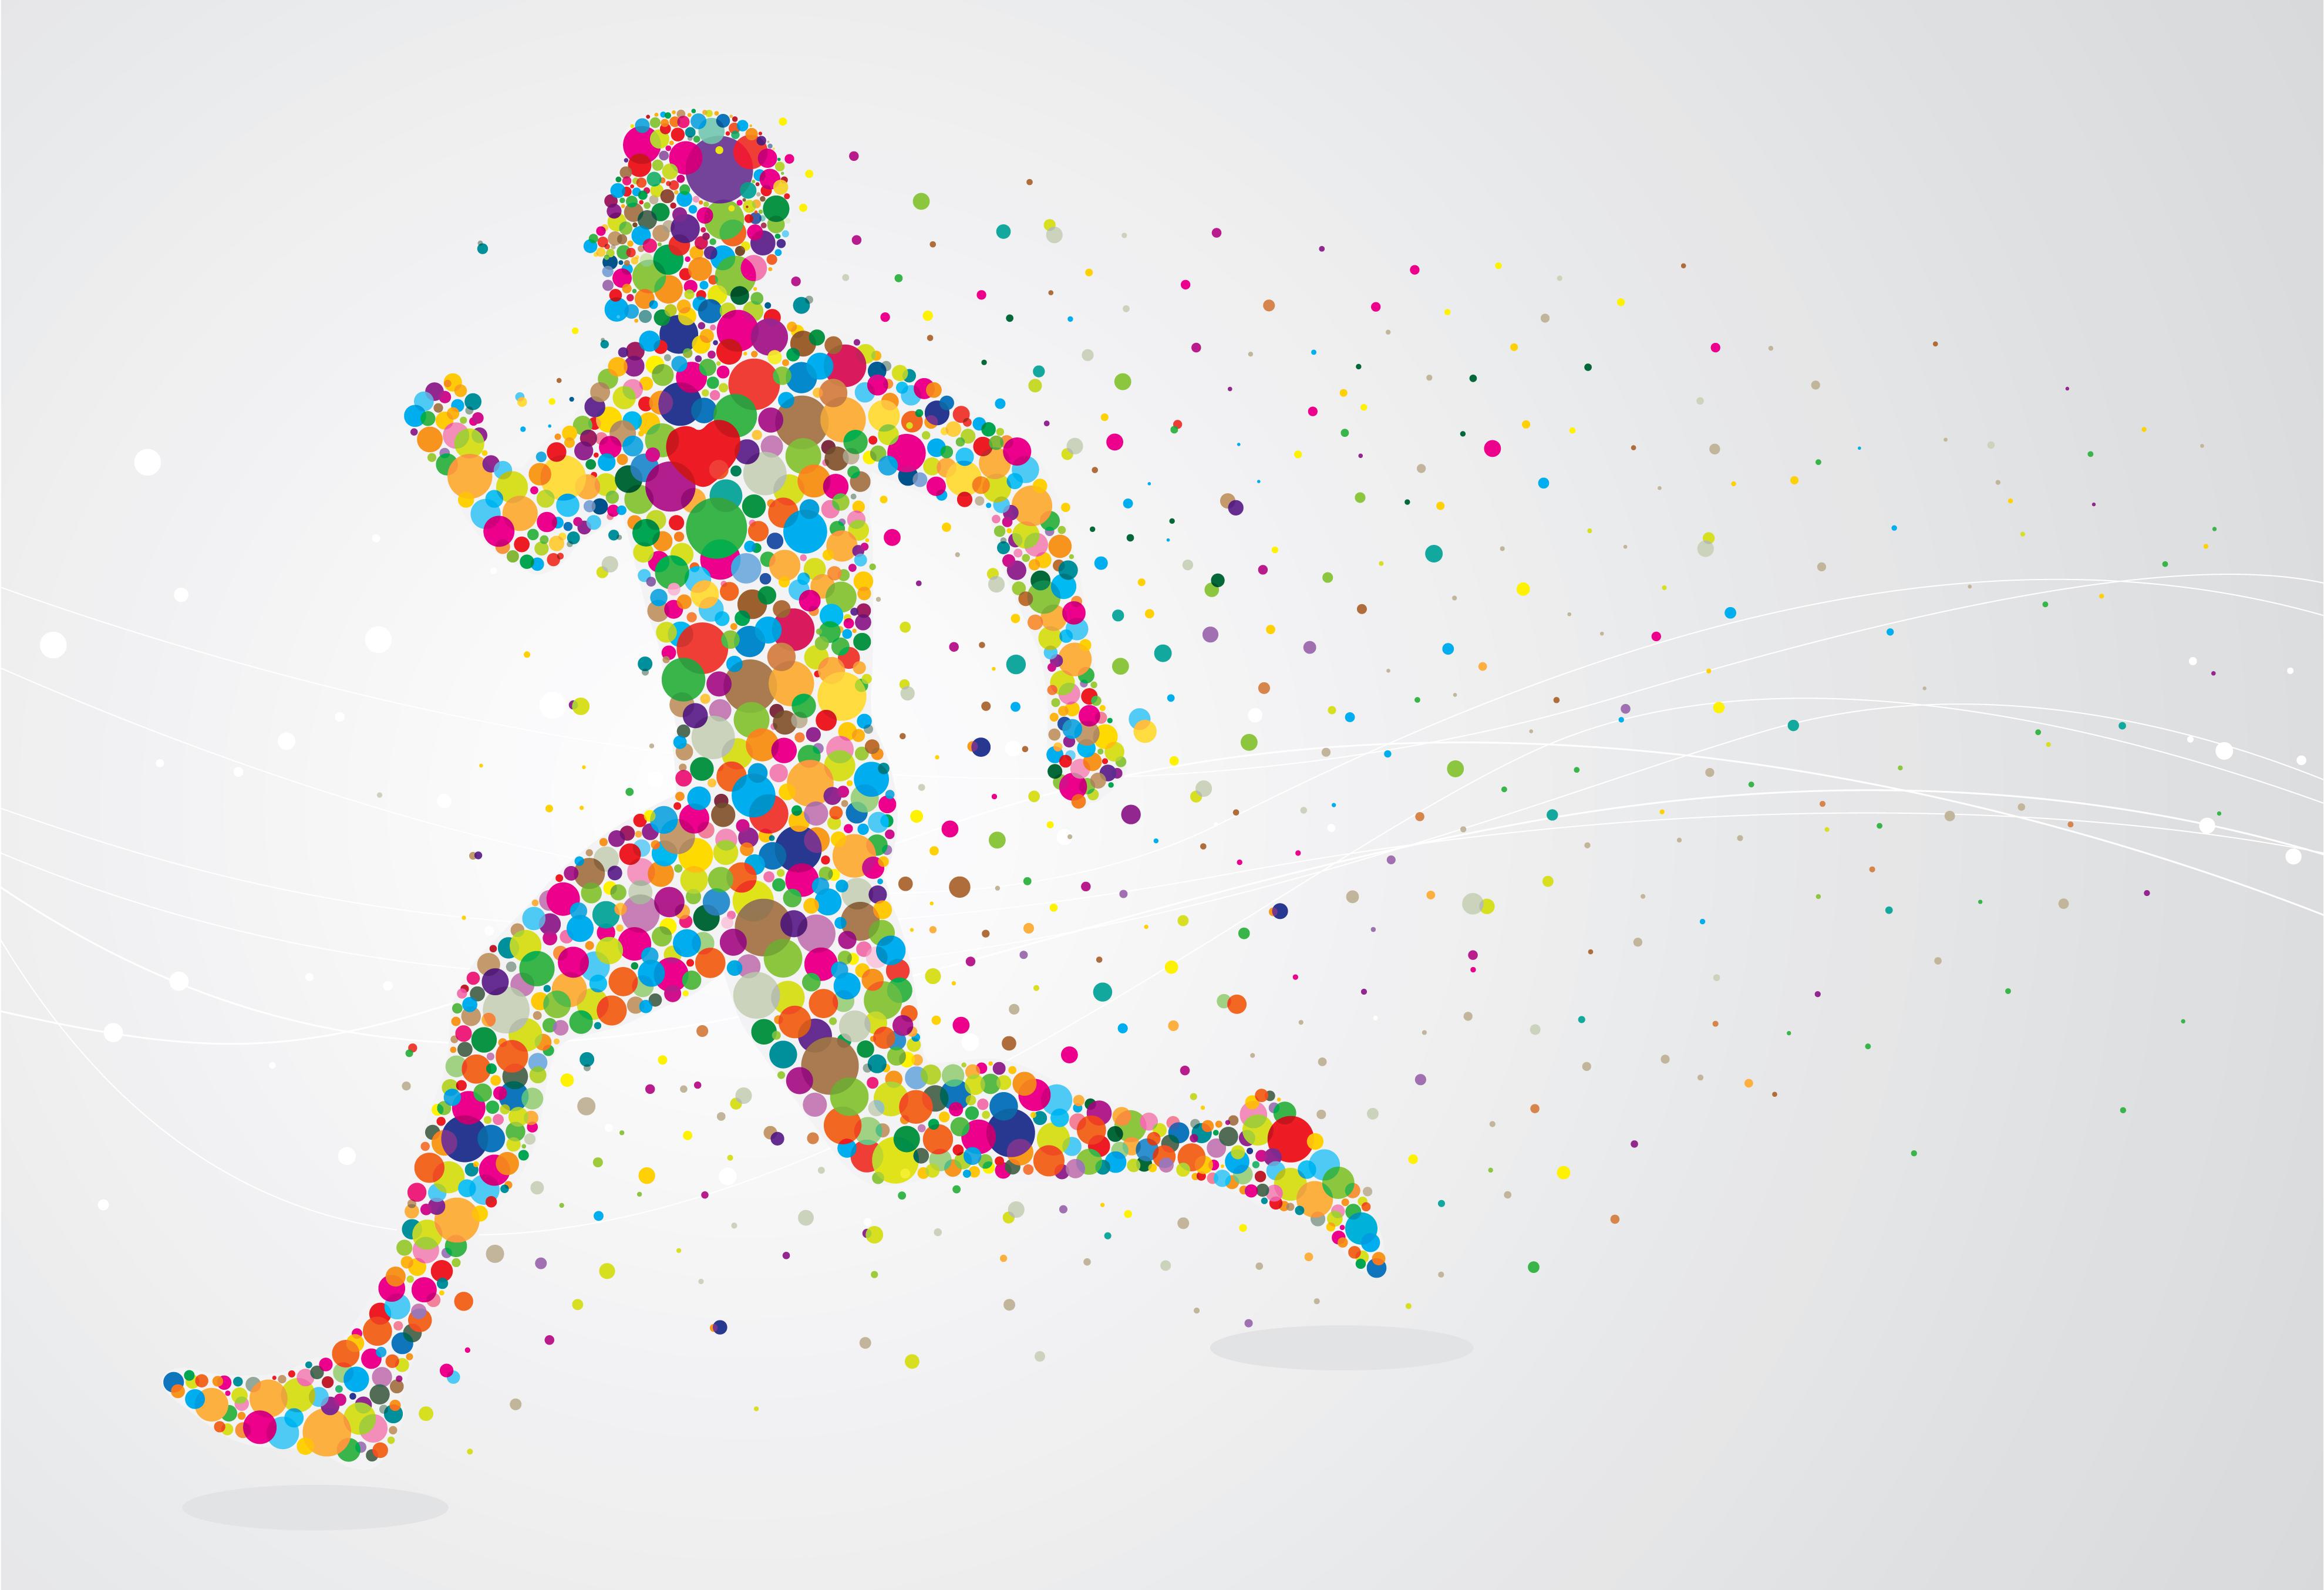 benefits of a healthy lifestyle wondrlust